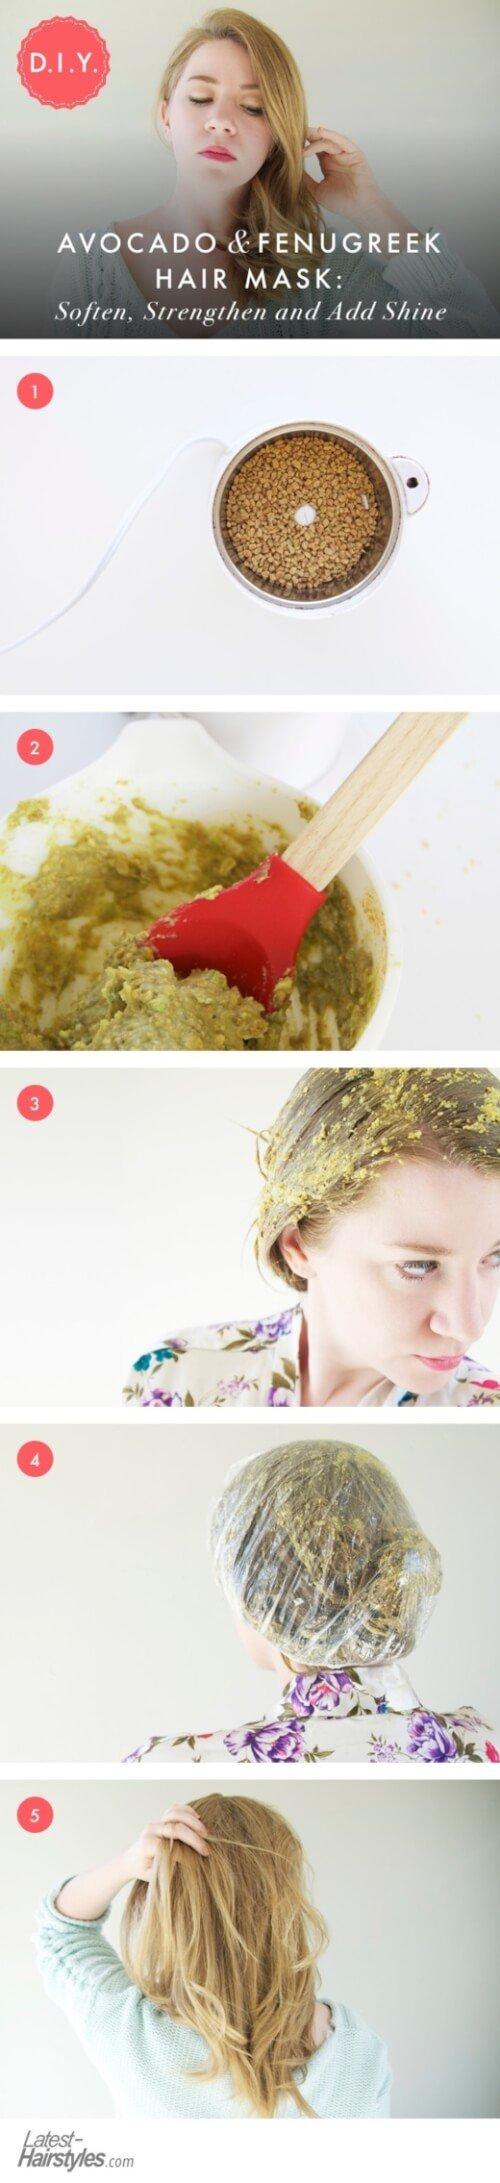 diy-avocado-hair-mask